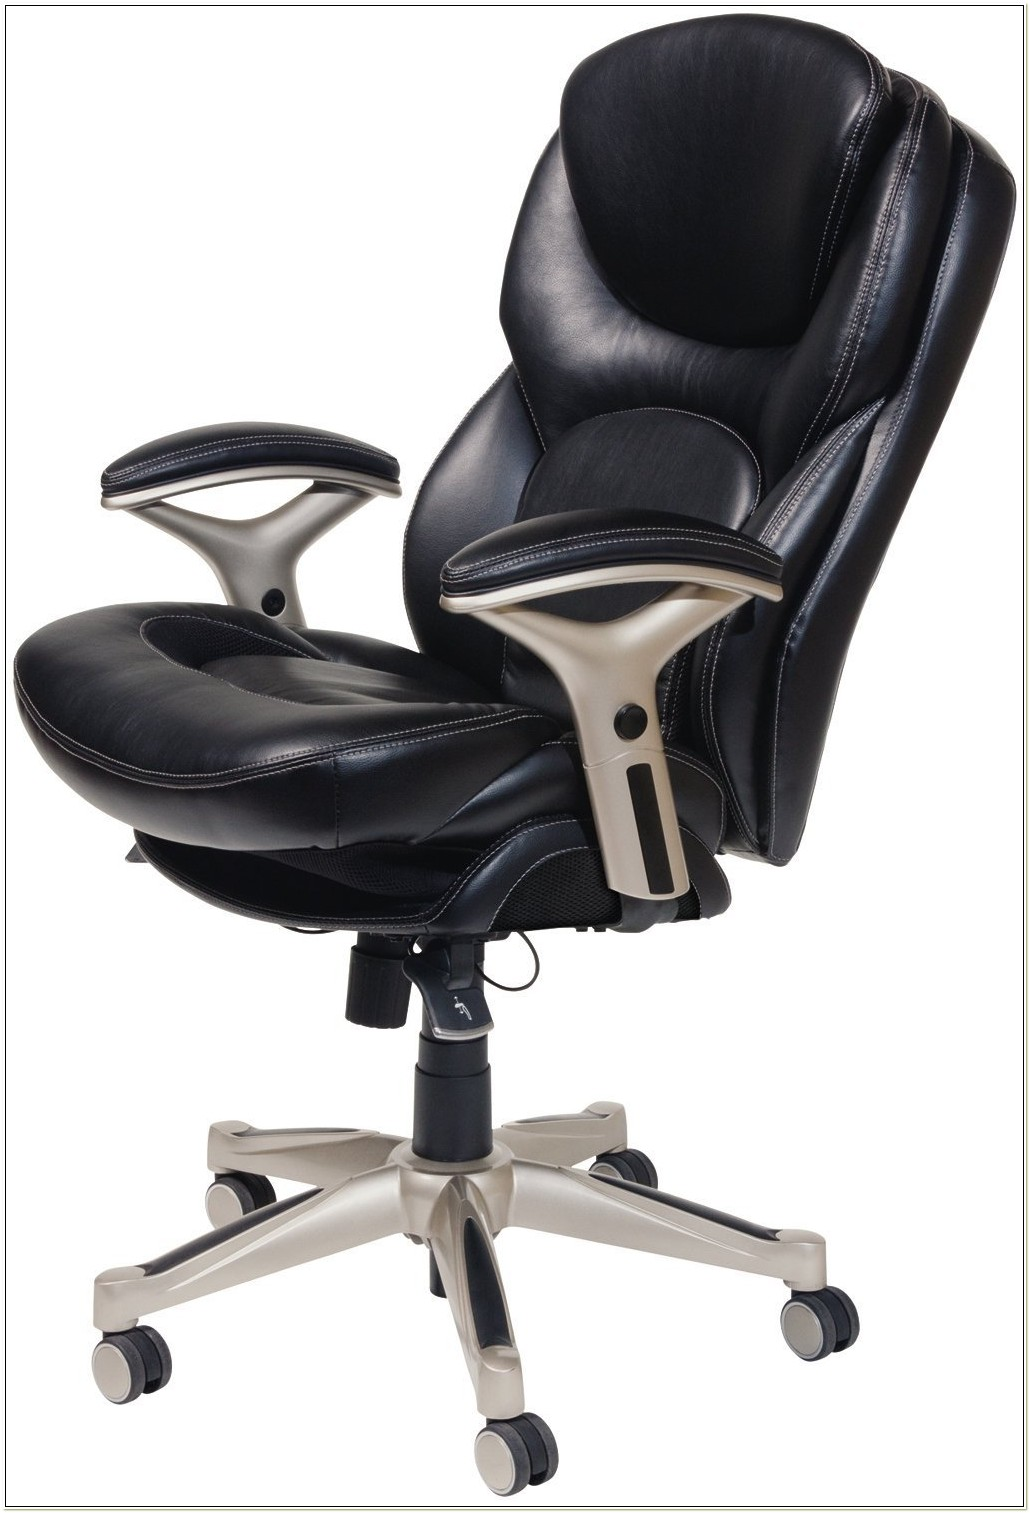 Serta Black Leather Office Chair